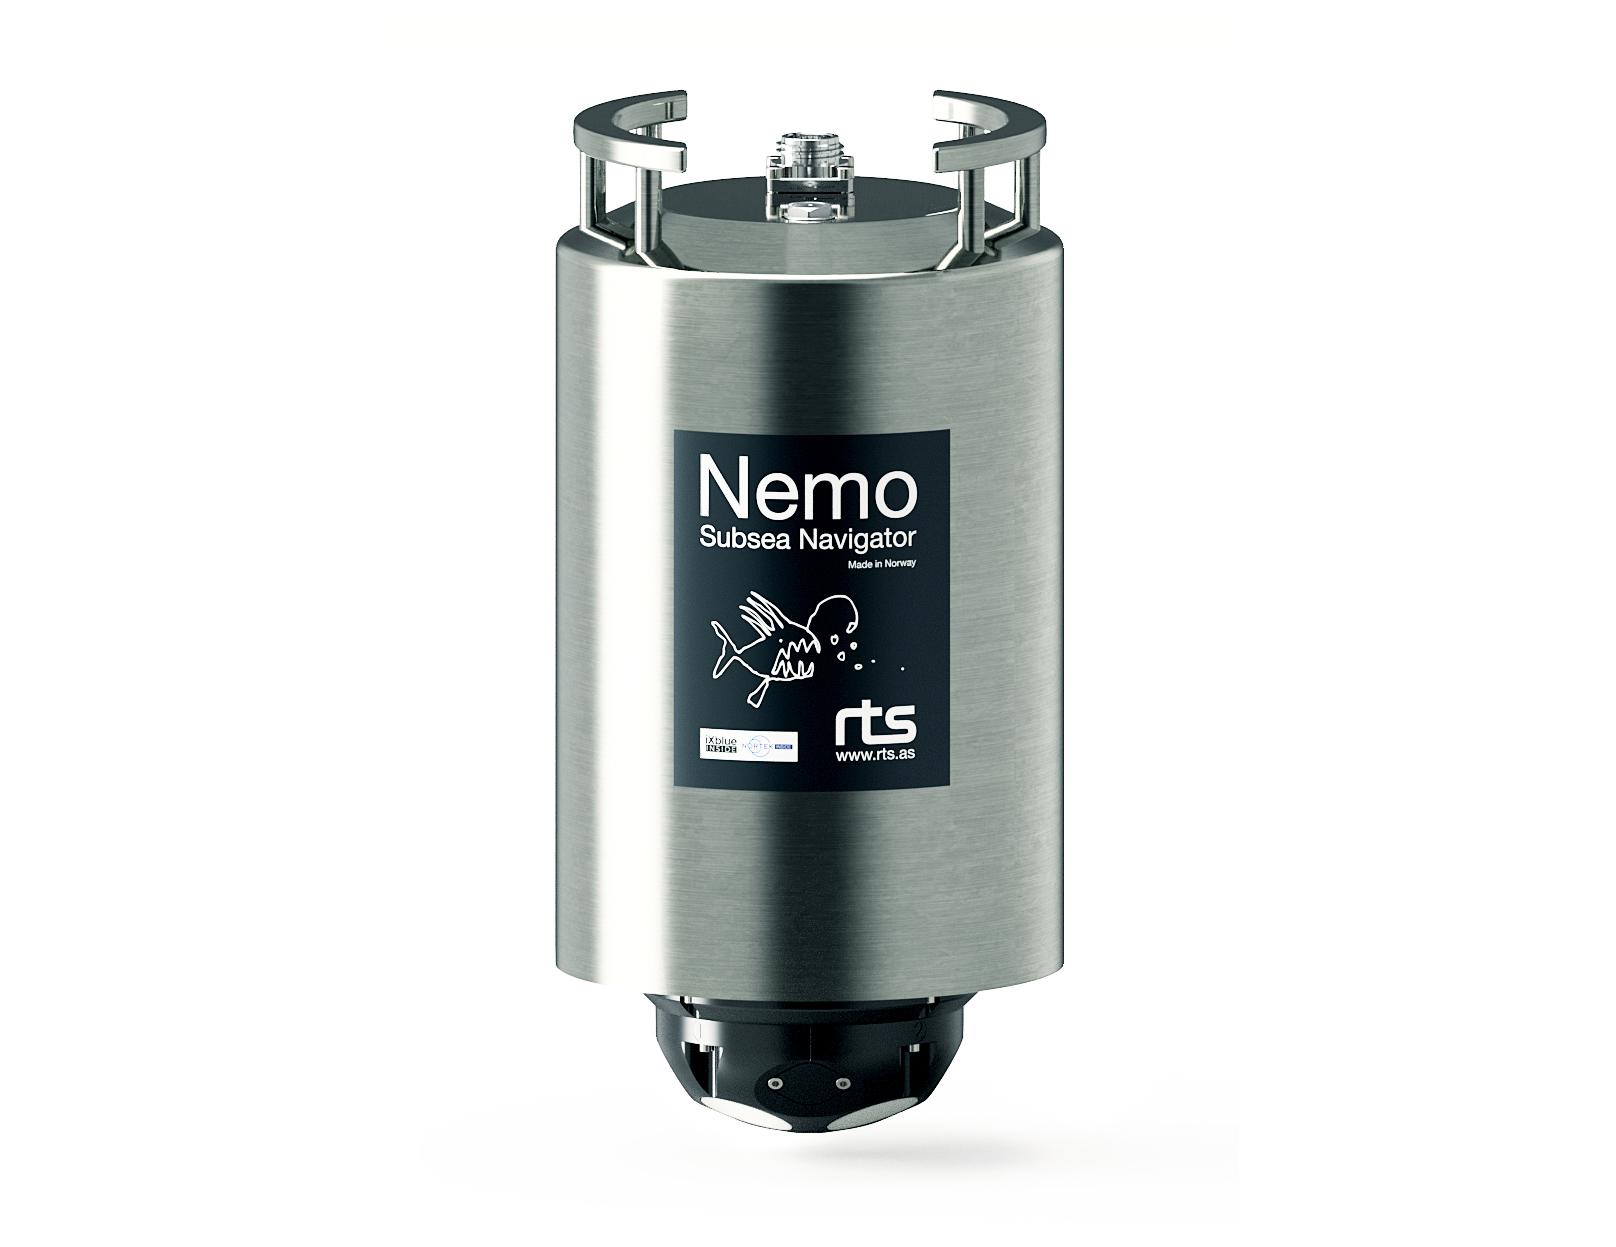 Nemo Subsea Navigator